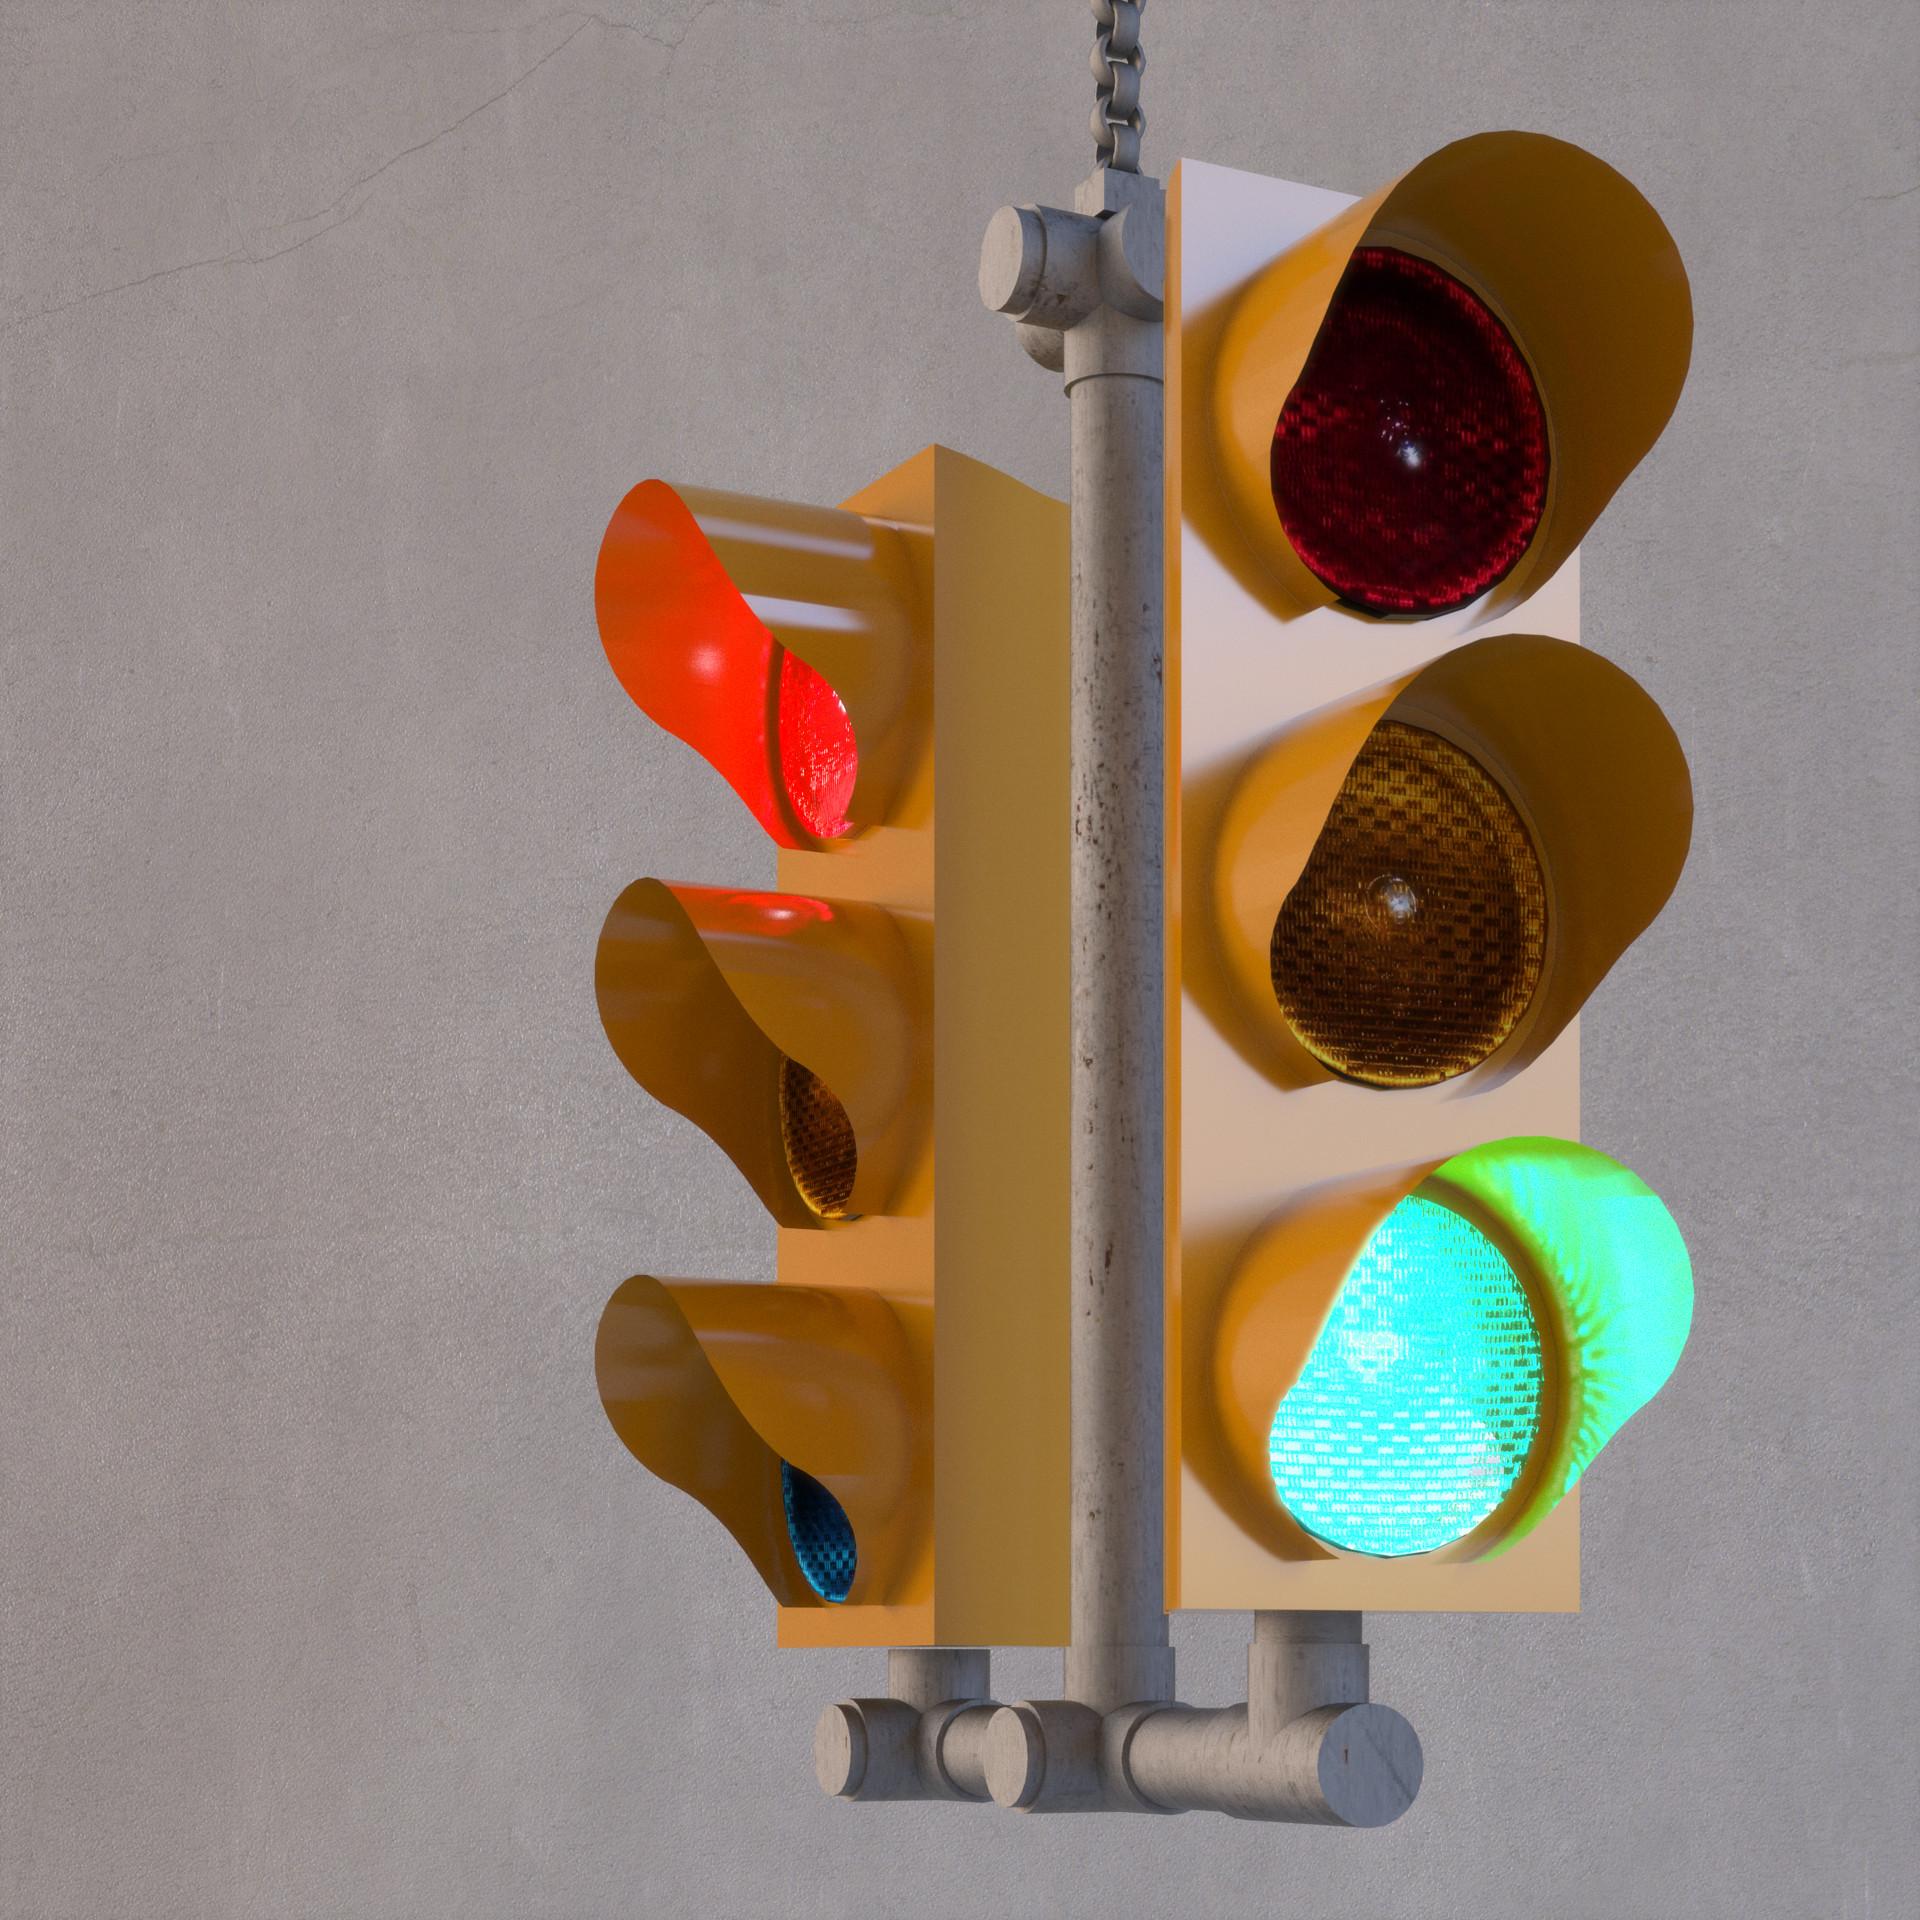 Duane kemp proposed kitchen signal light 02